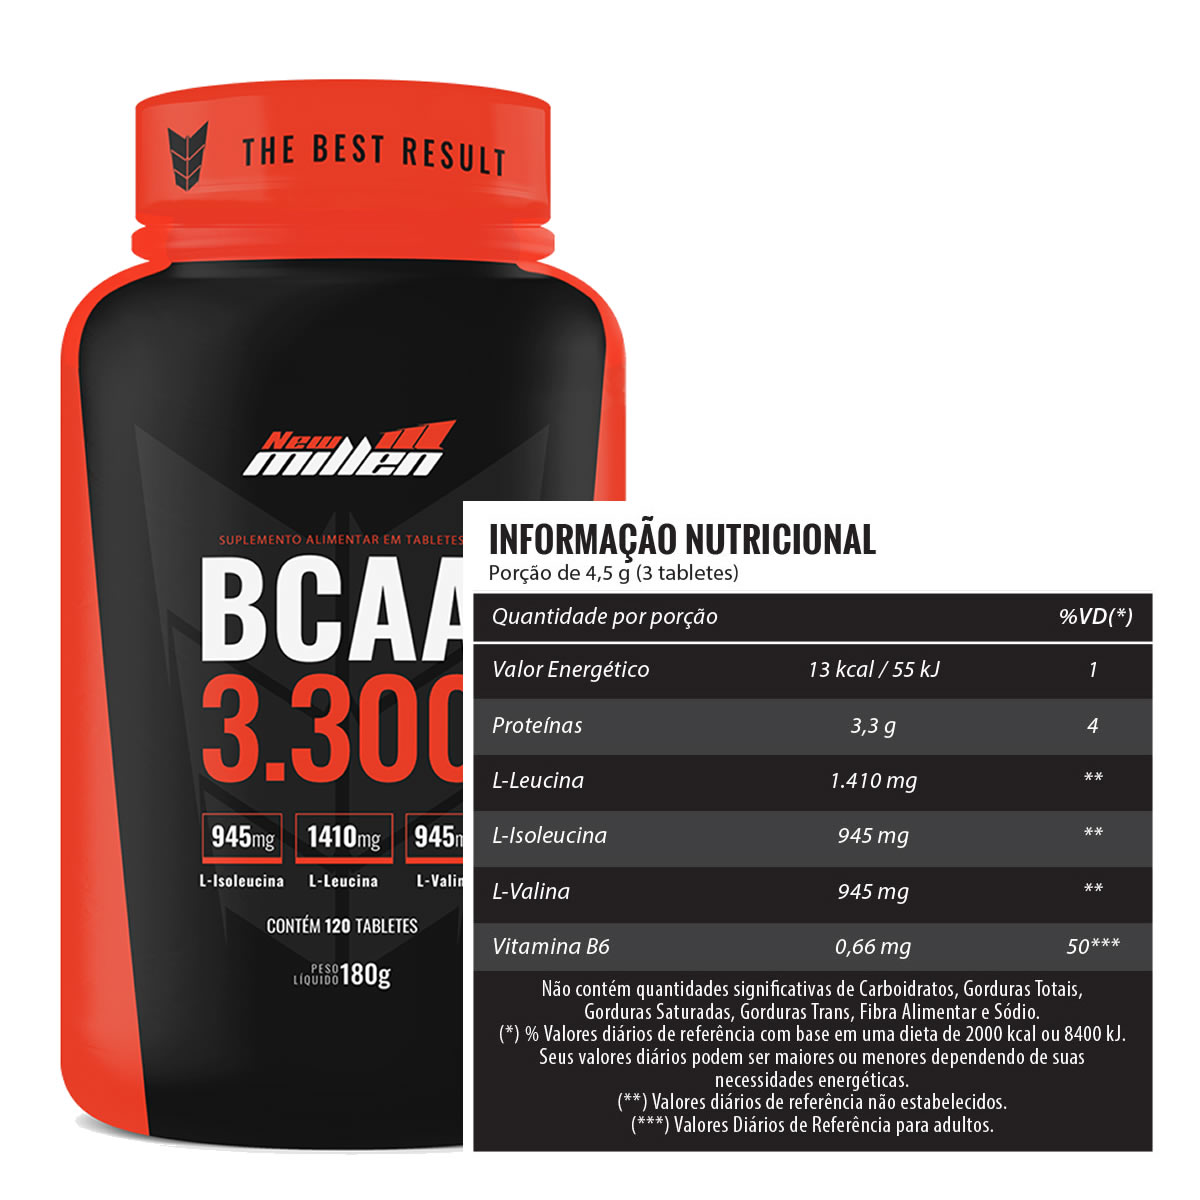 BCAA 3.300mg + D-Ribose 120 Tabletes - New Millen